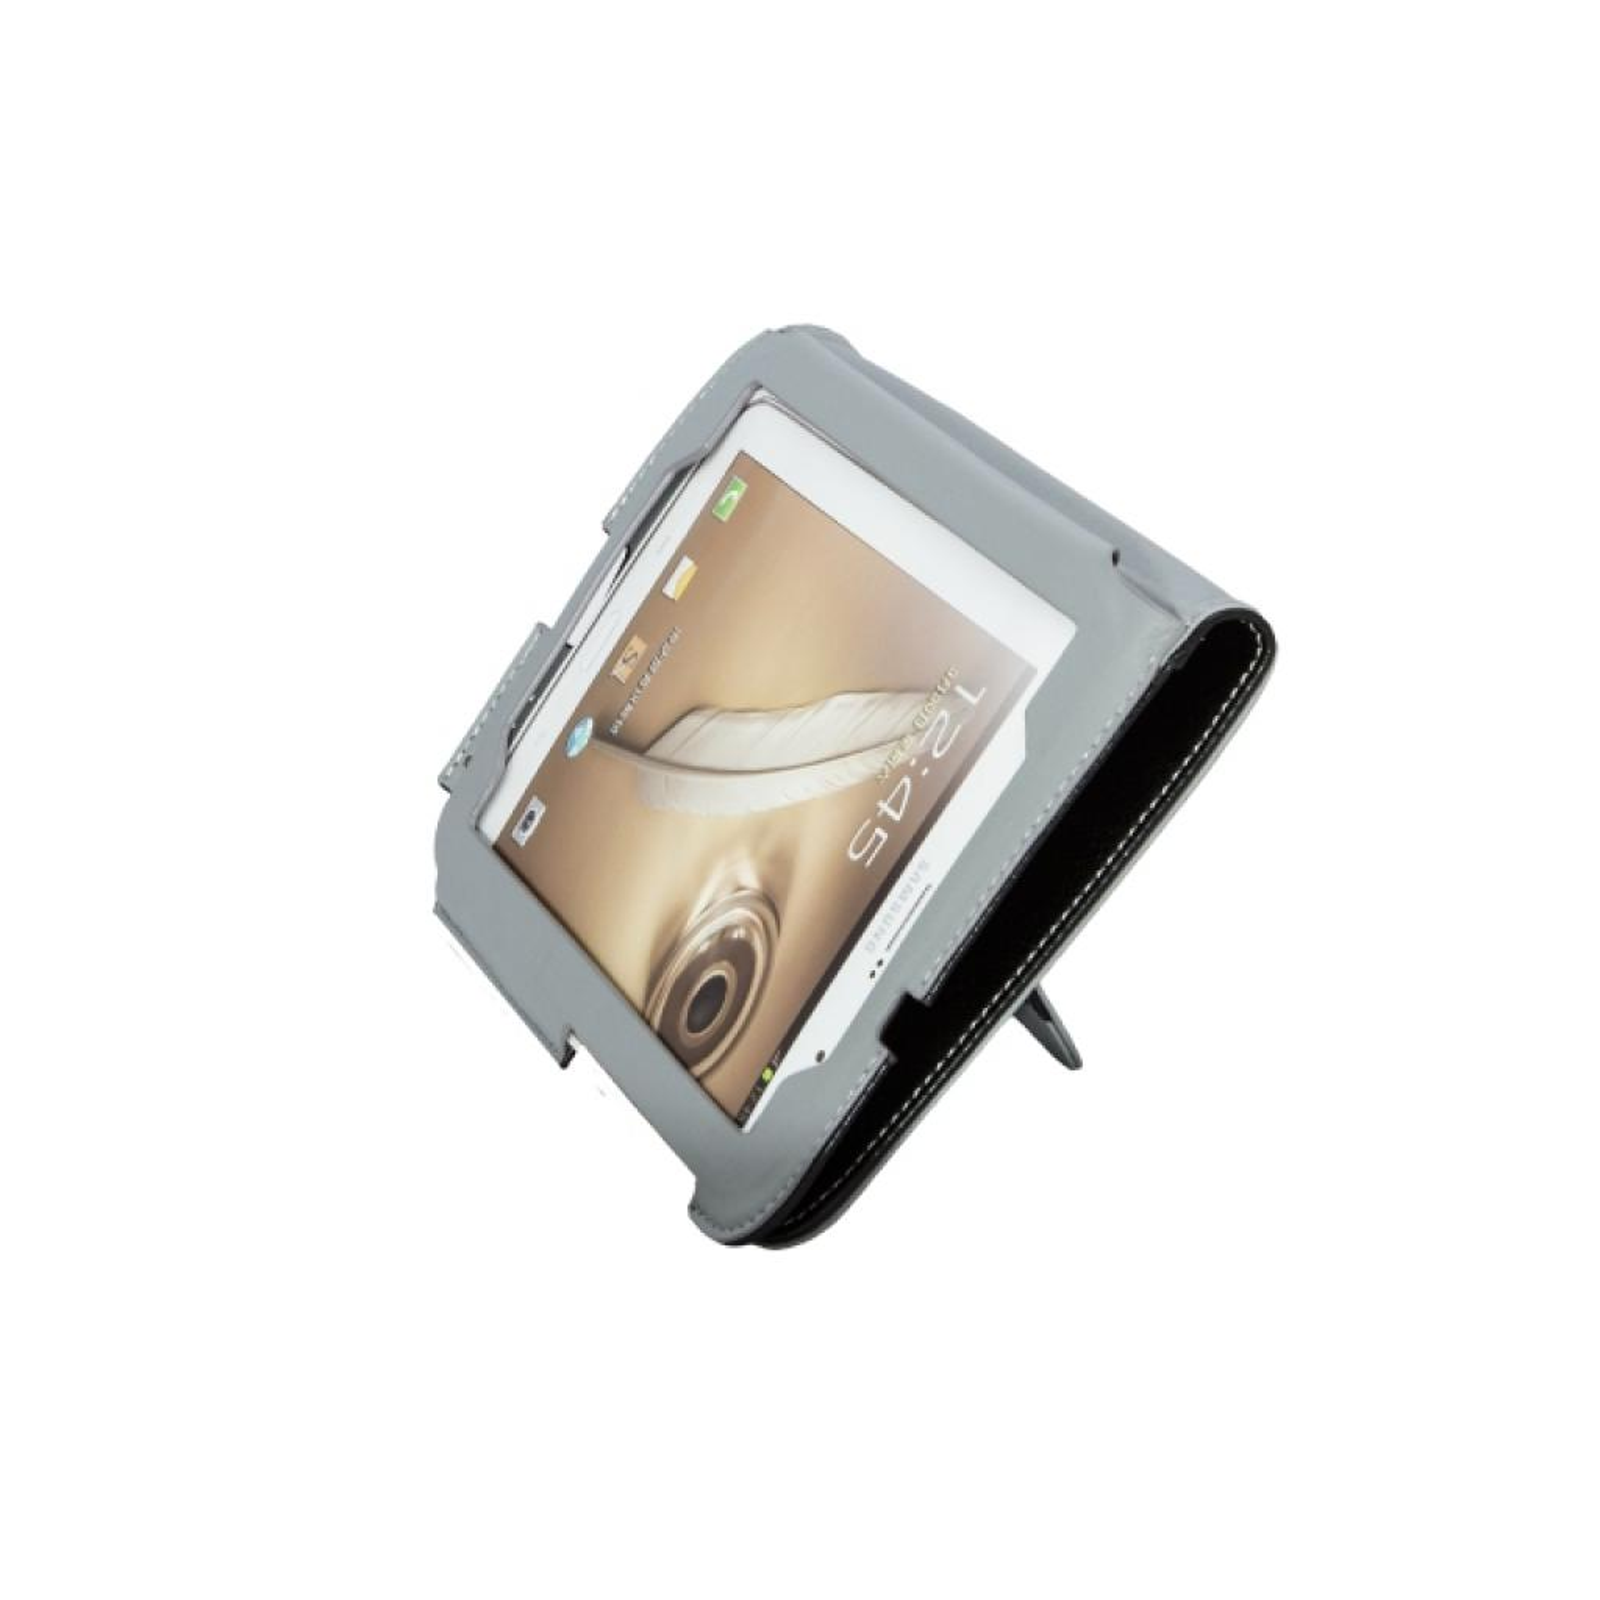 Чехол для планшета Drobak 8 Samsung Galaxy Note (N5100) Comfort Style/Black (215256) изображение 2